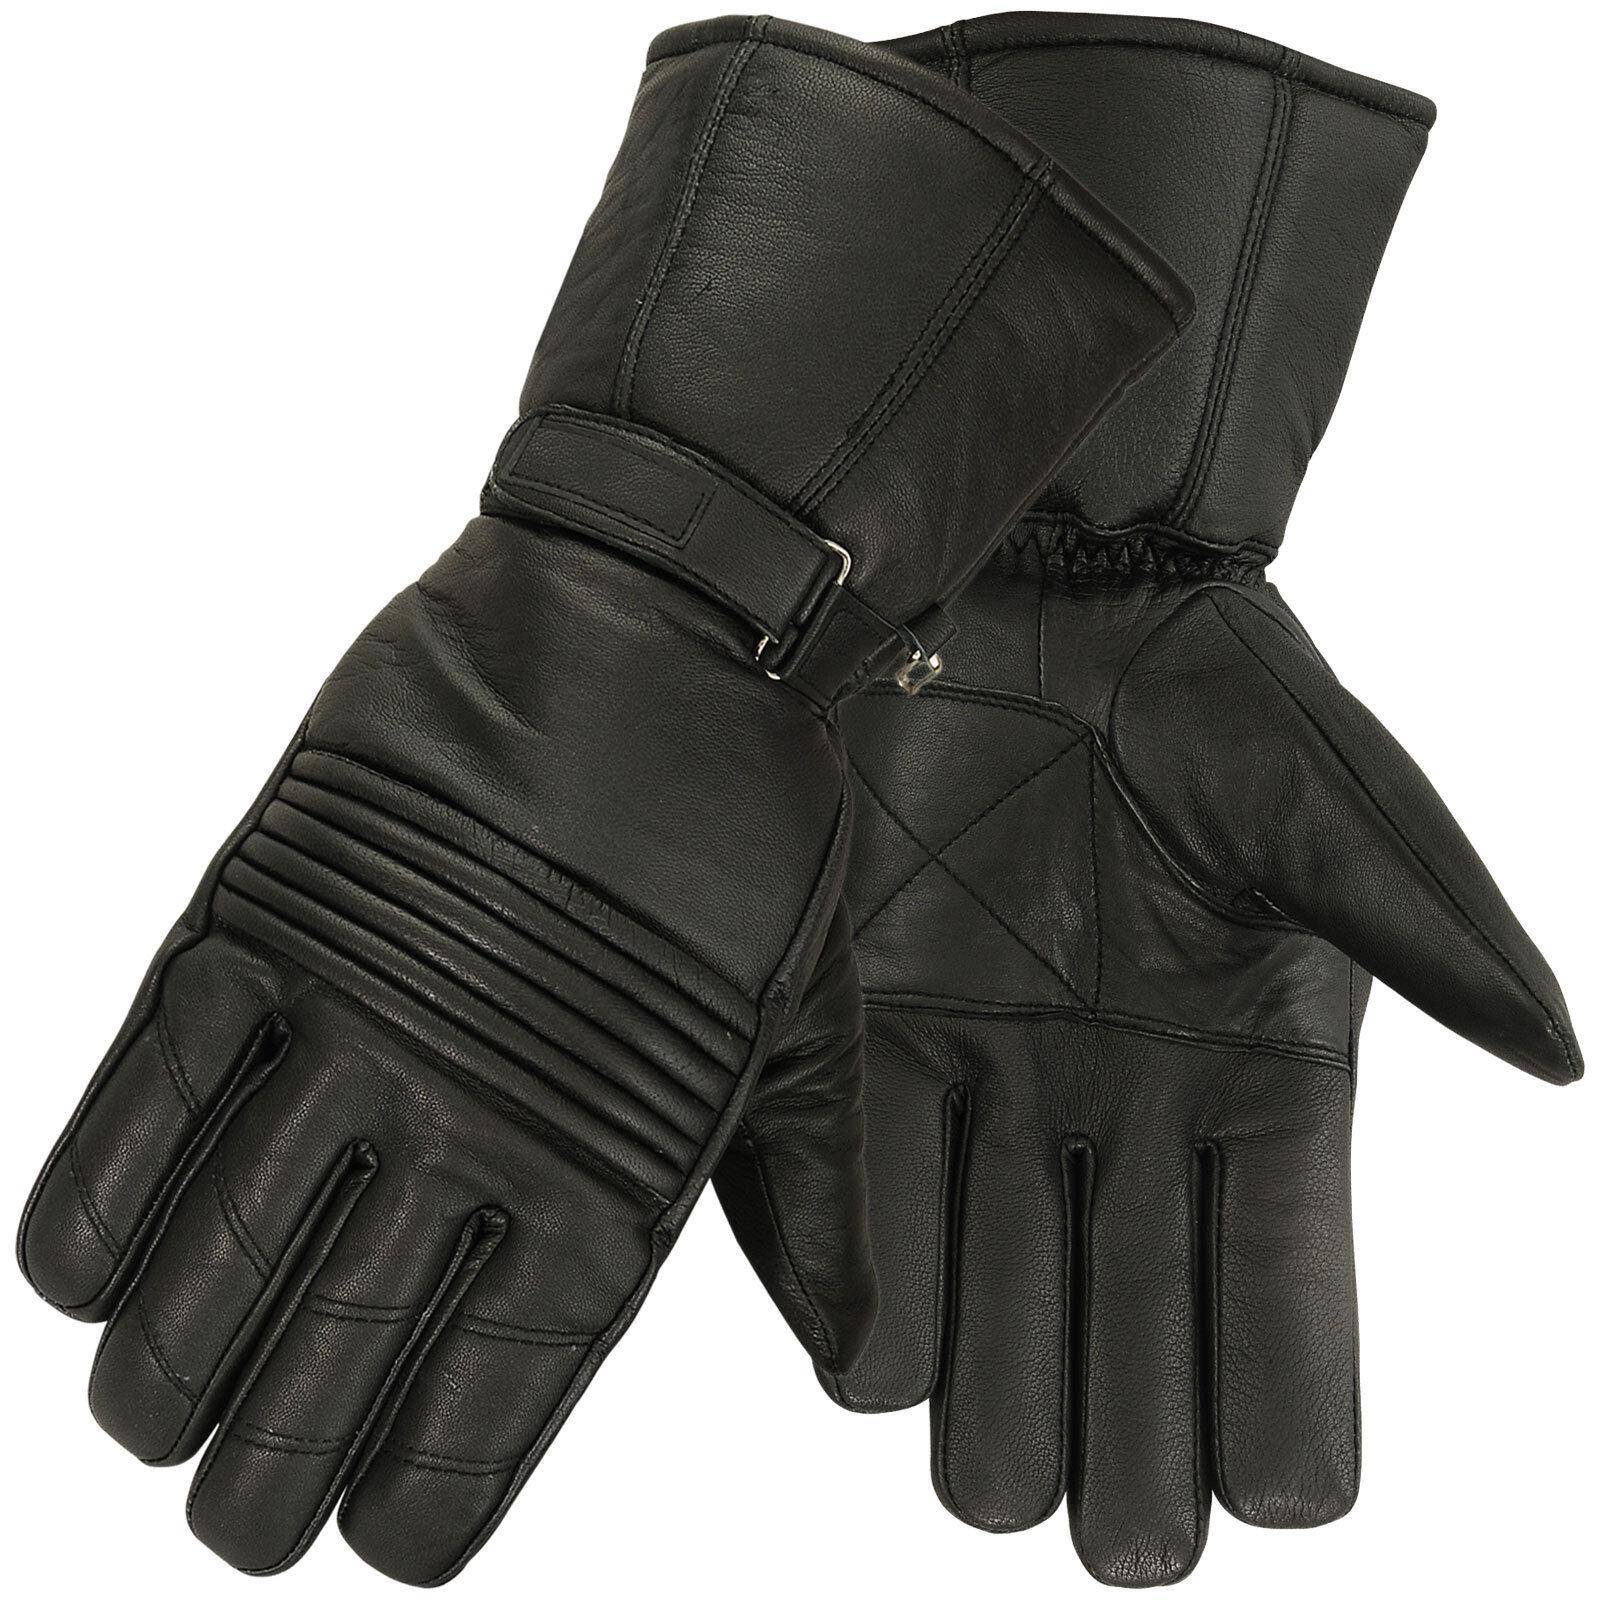 Best motorcycle gloves nz - Winter Leather Motorcycle Gloves Motorbike Waterproof Glove Thermal Black Medium